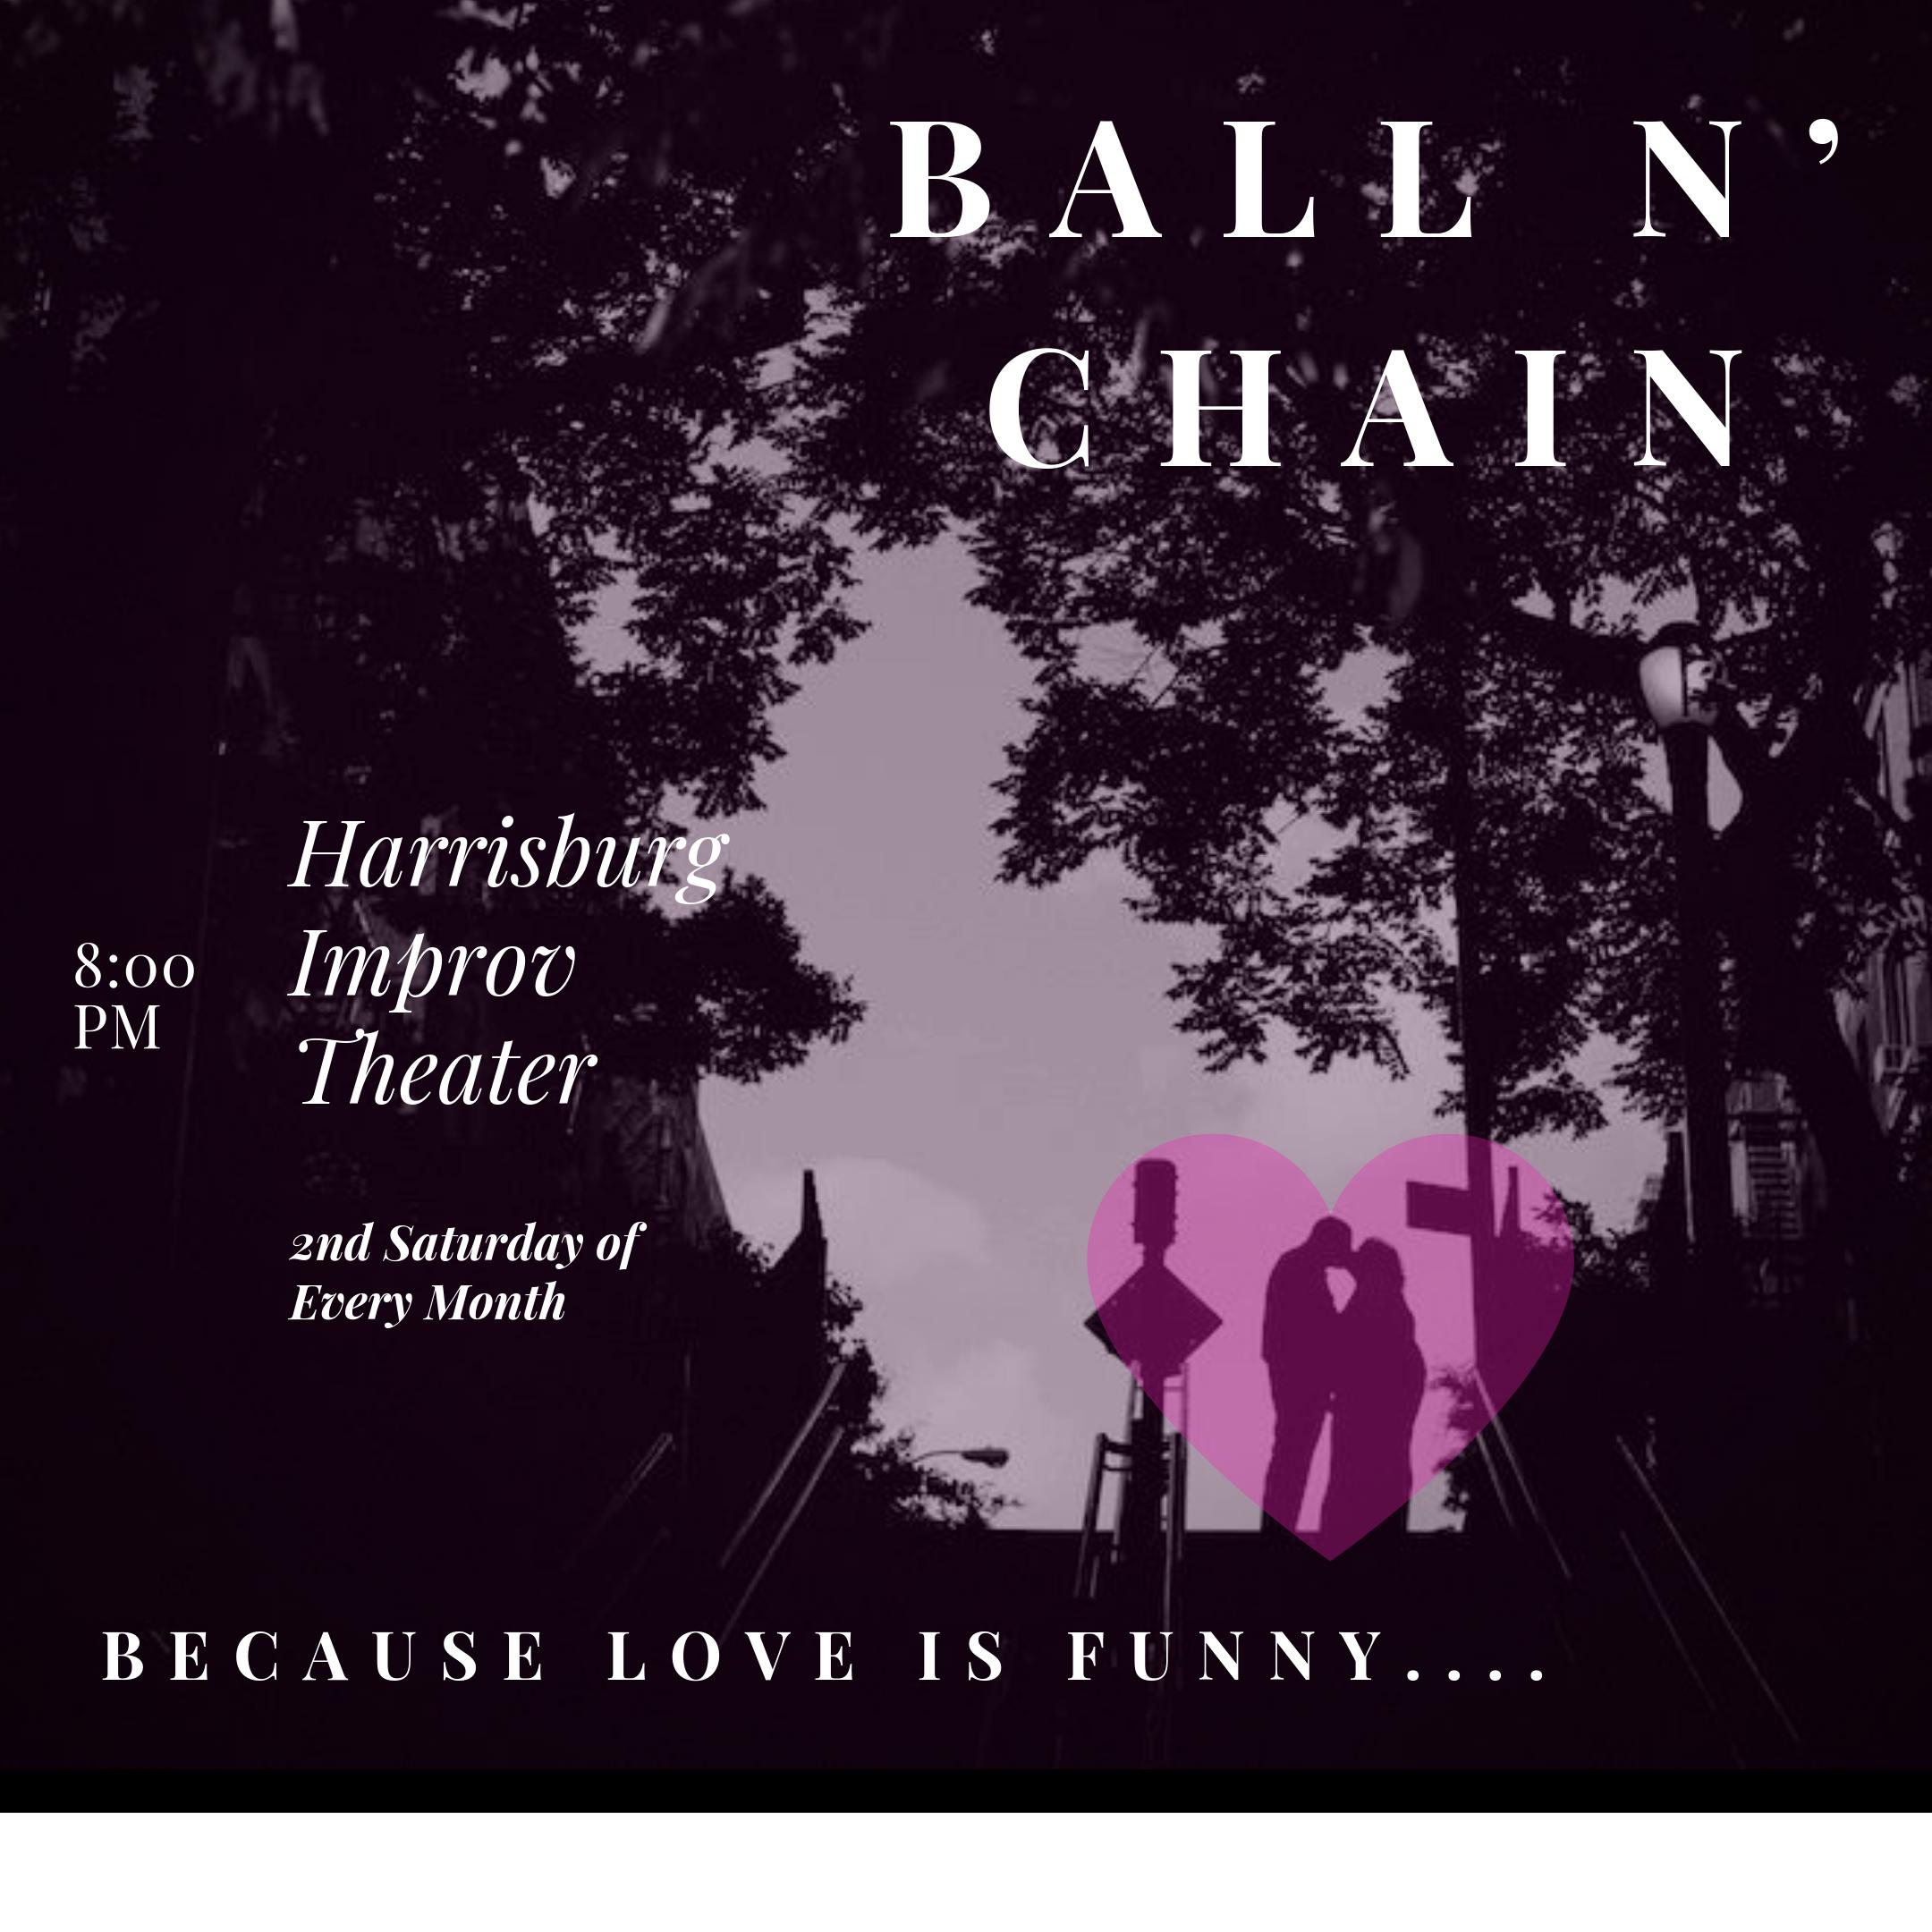 Ball n' chain.png